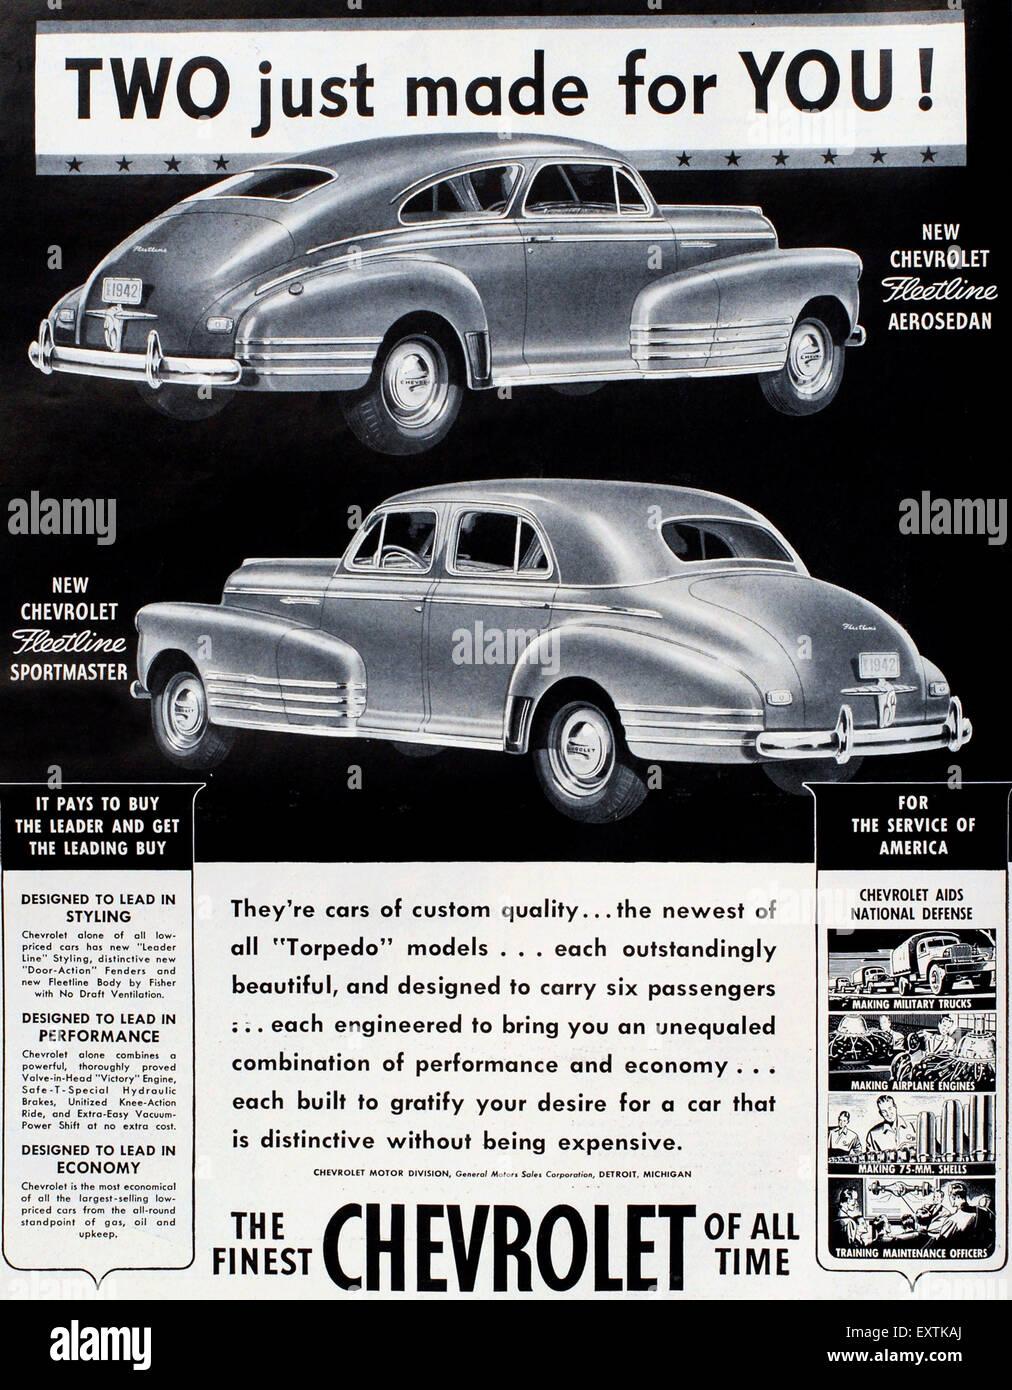 USA Chevrolet Magazine Advert - Stock Image